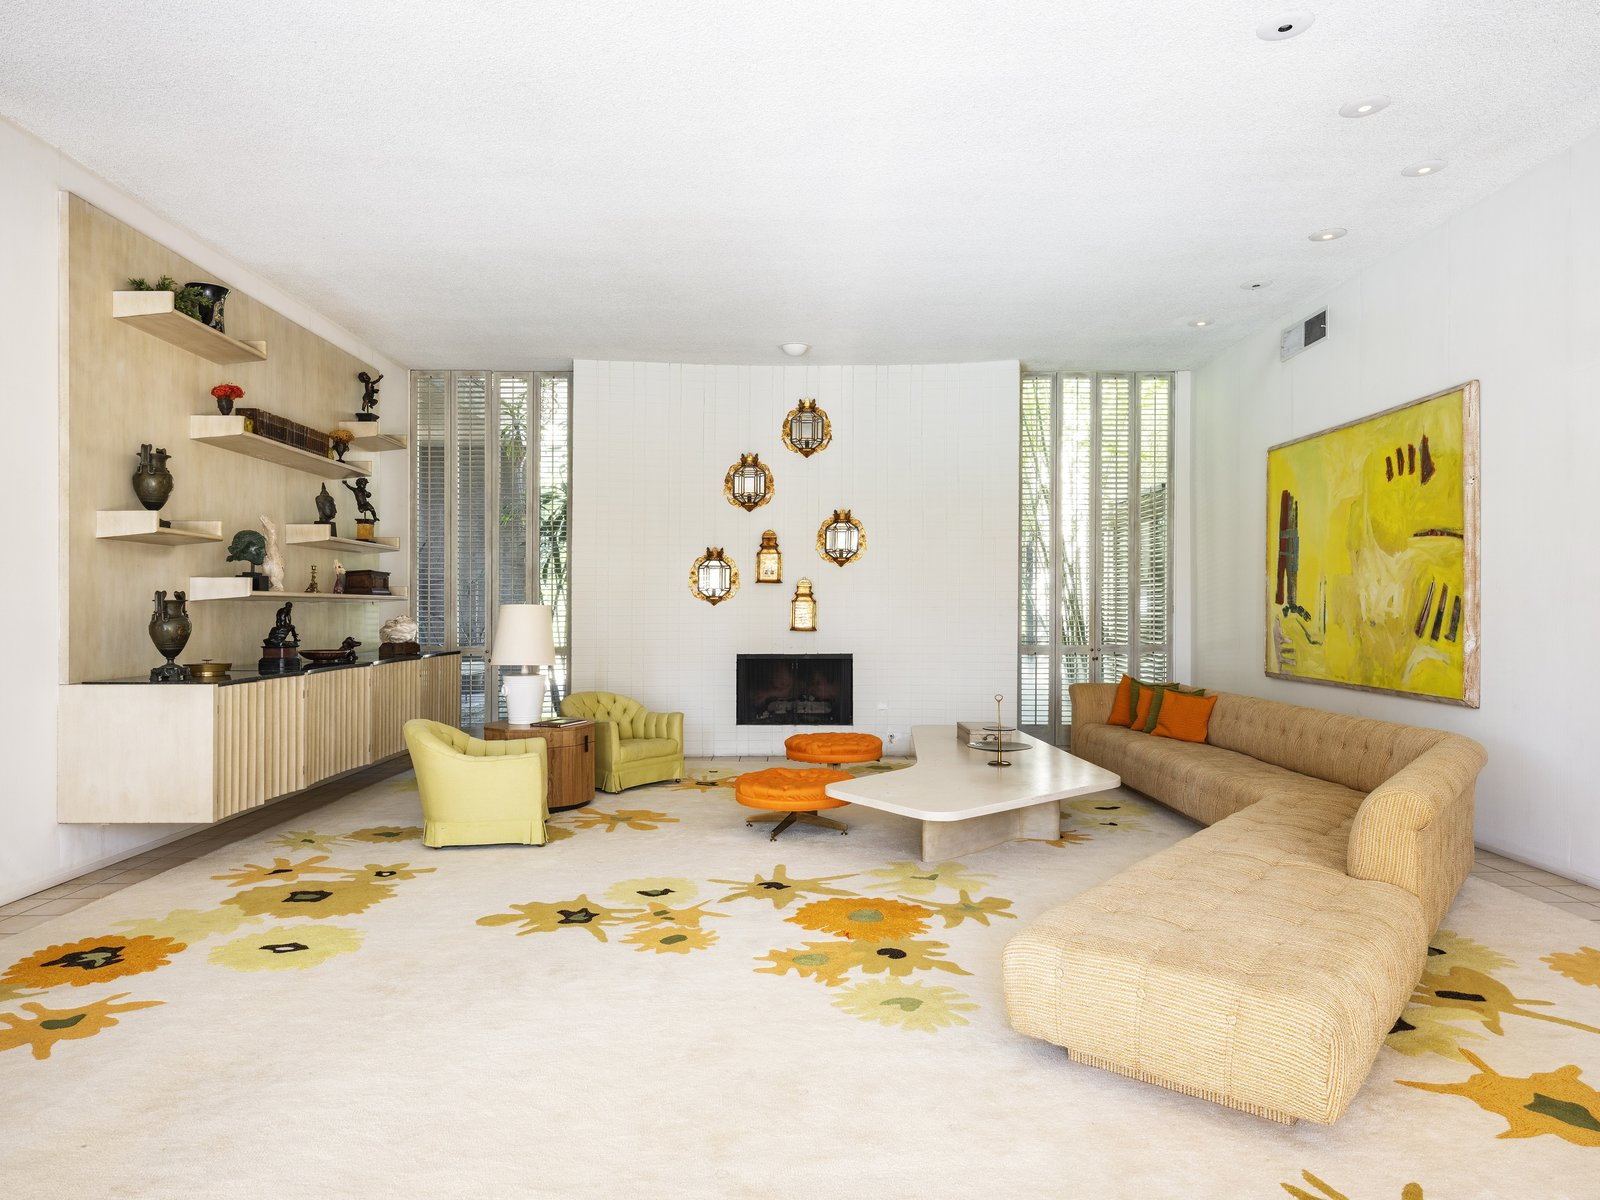 Arthur Elrod Palm Springs Escape House living room